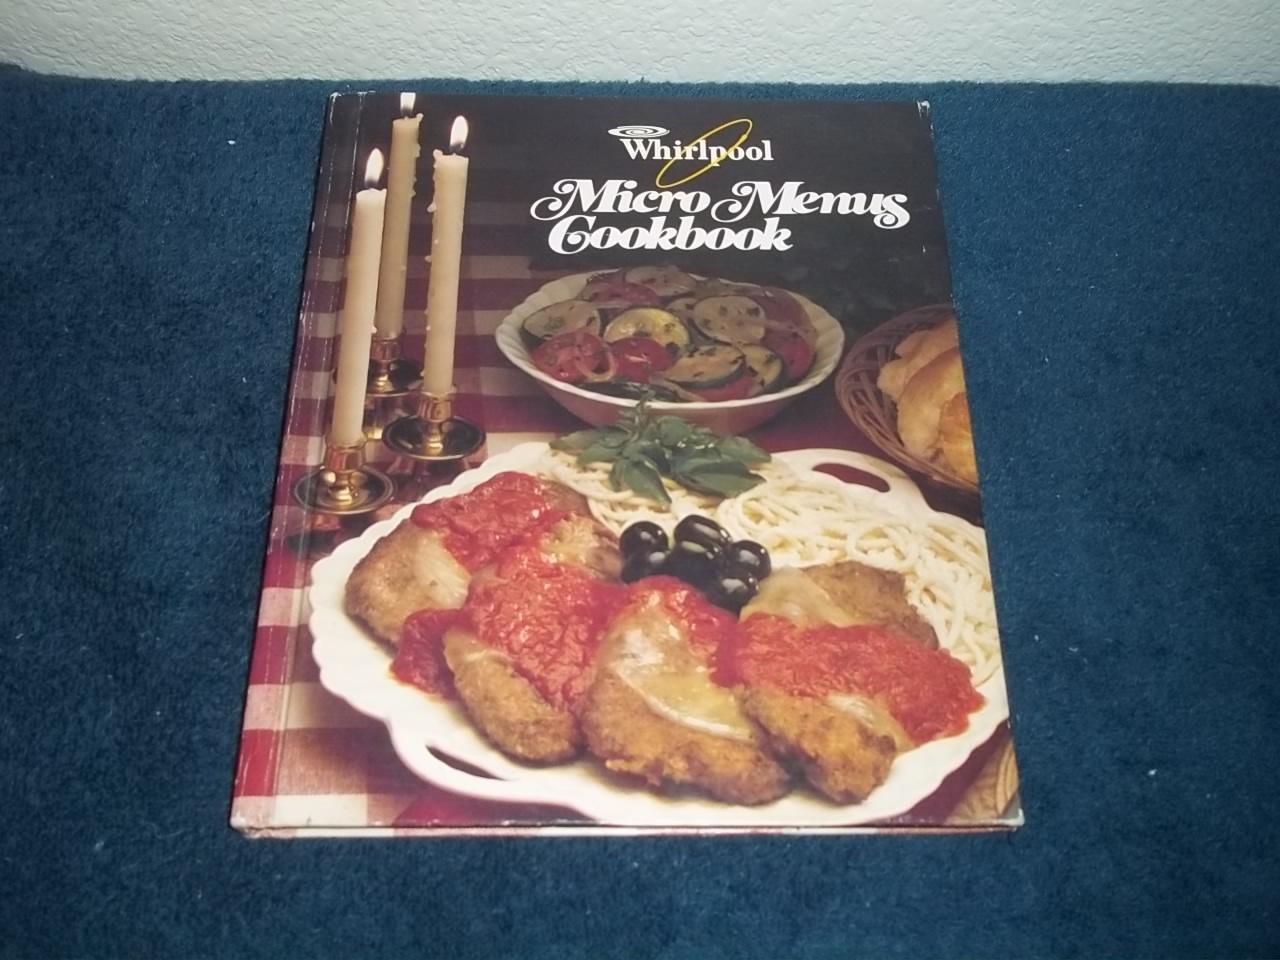 Whirlpool micro menus cookbook 1